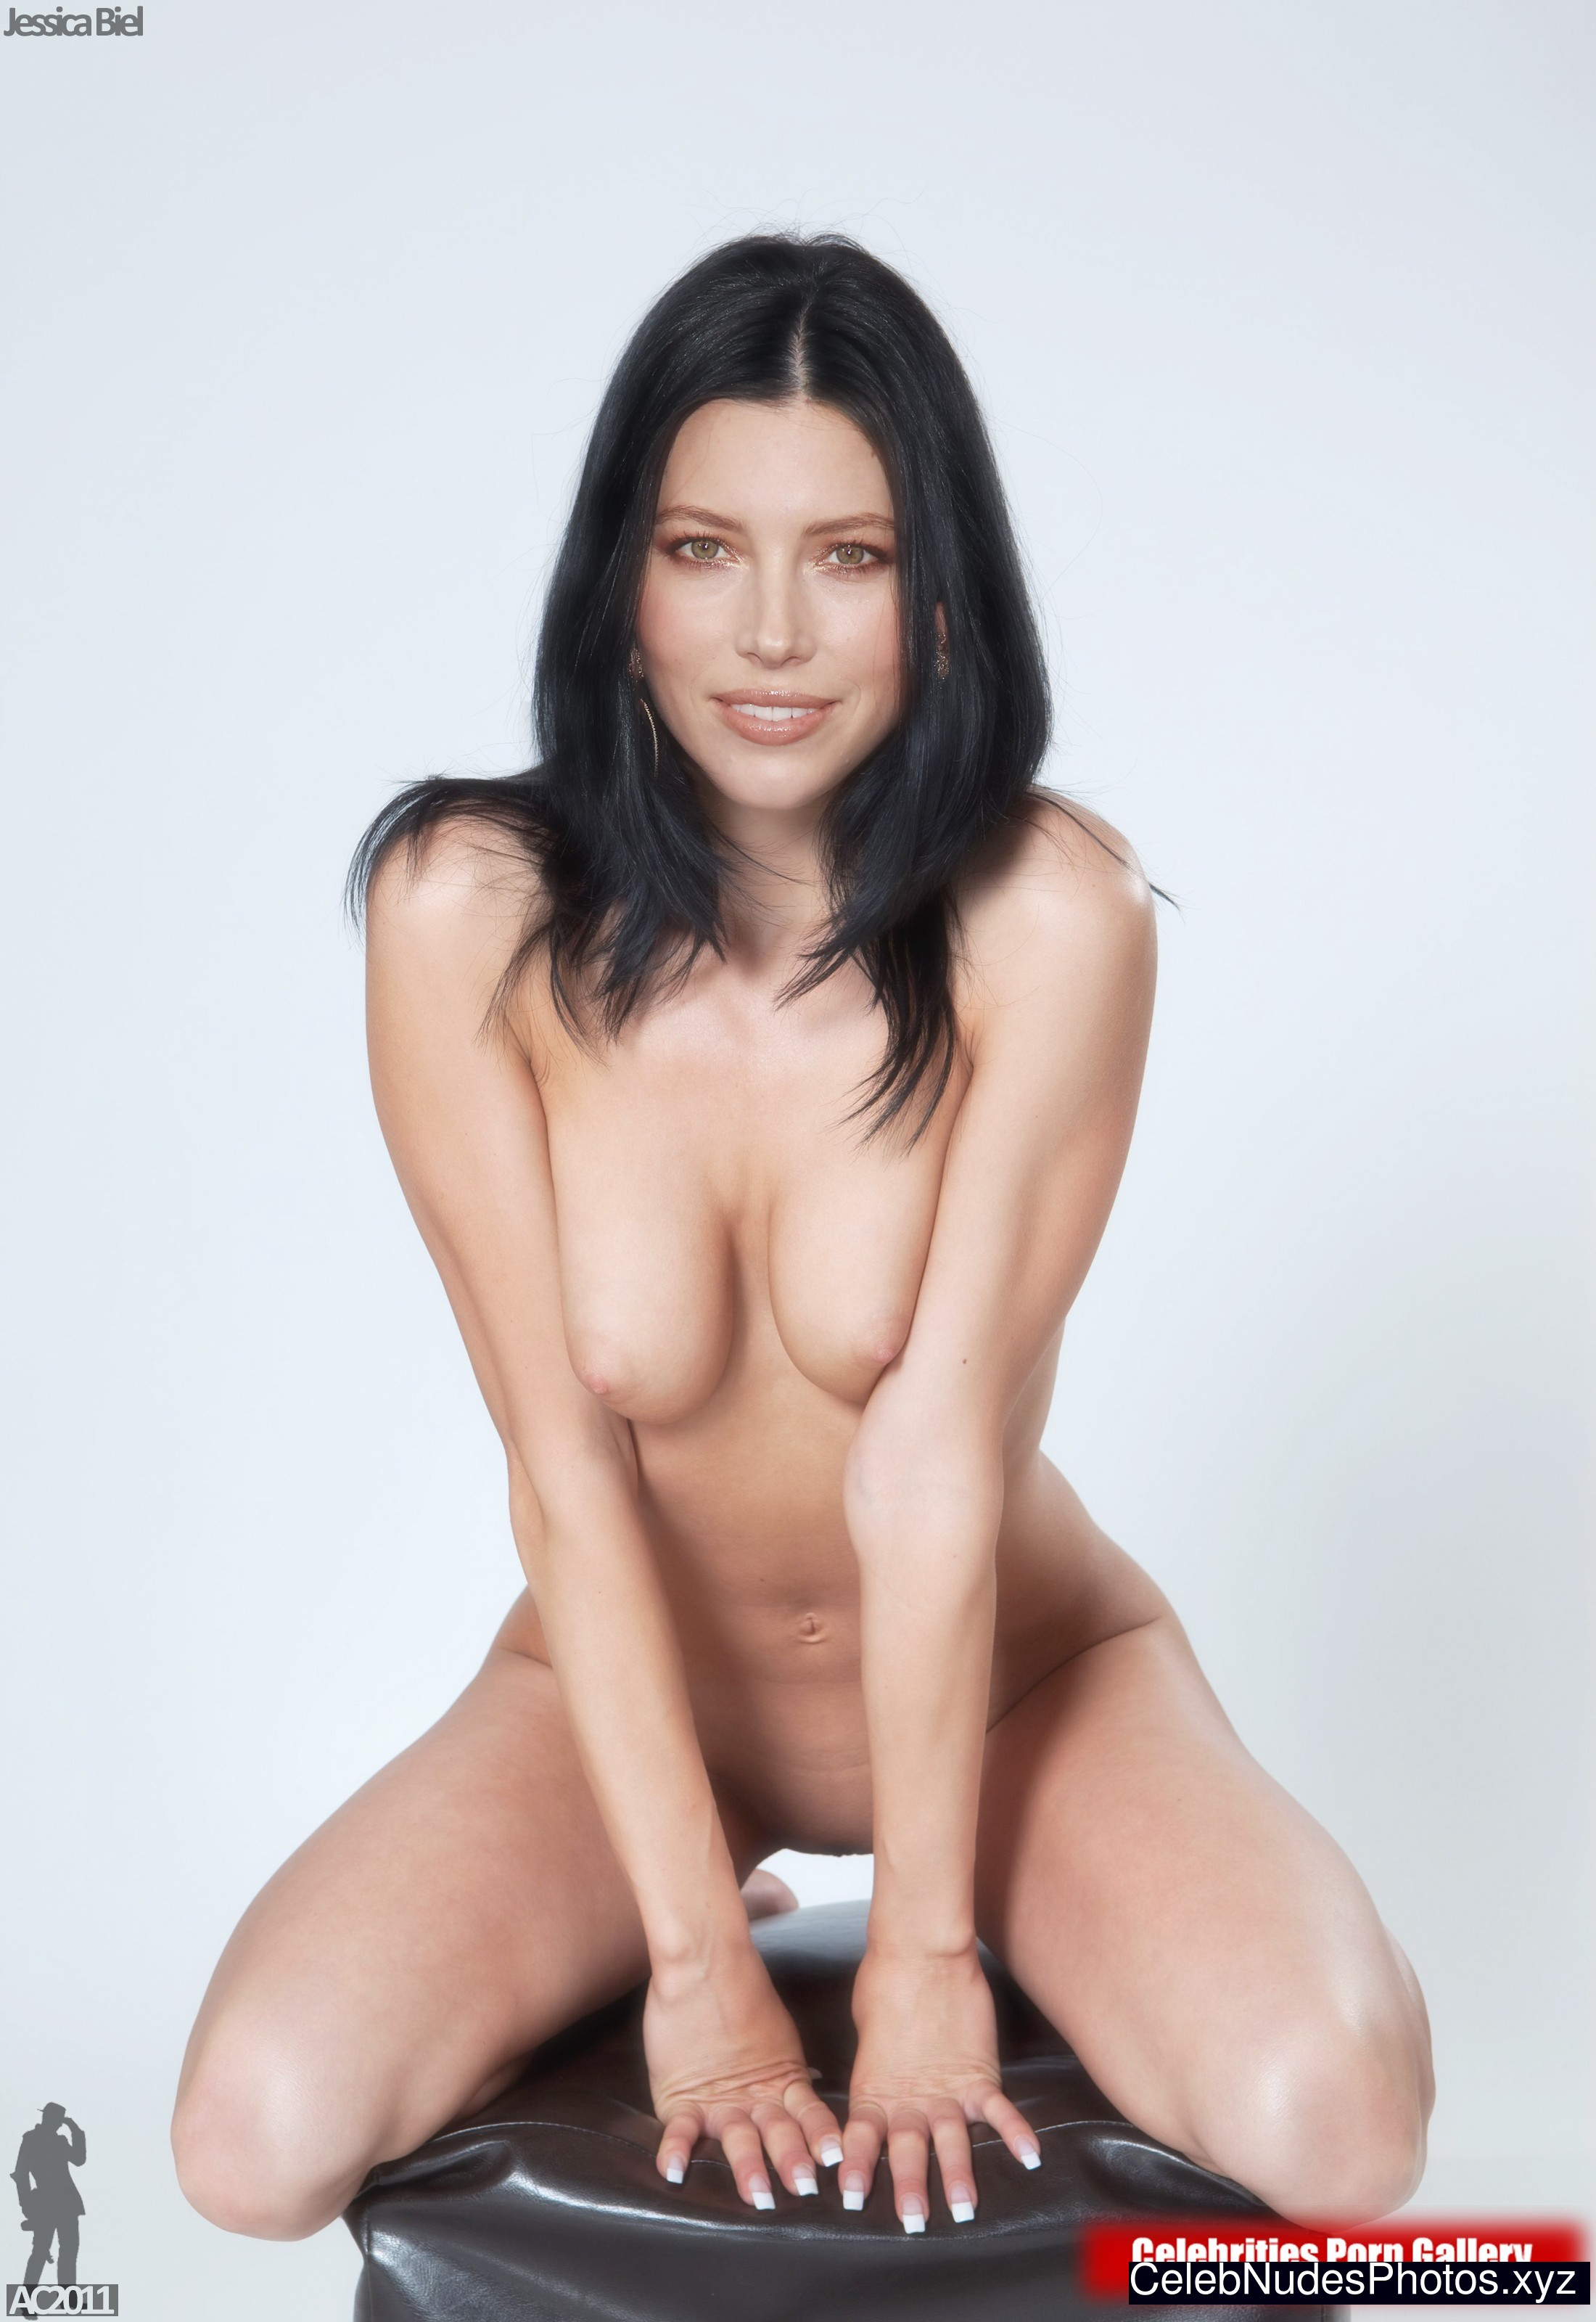 Jessica Biel Celebrity Nude Pic sexy 24